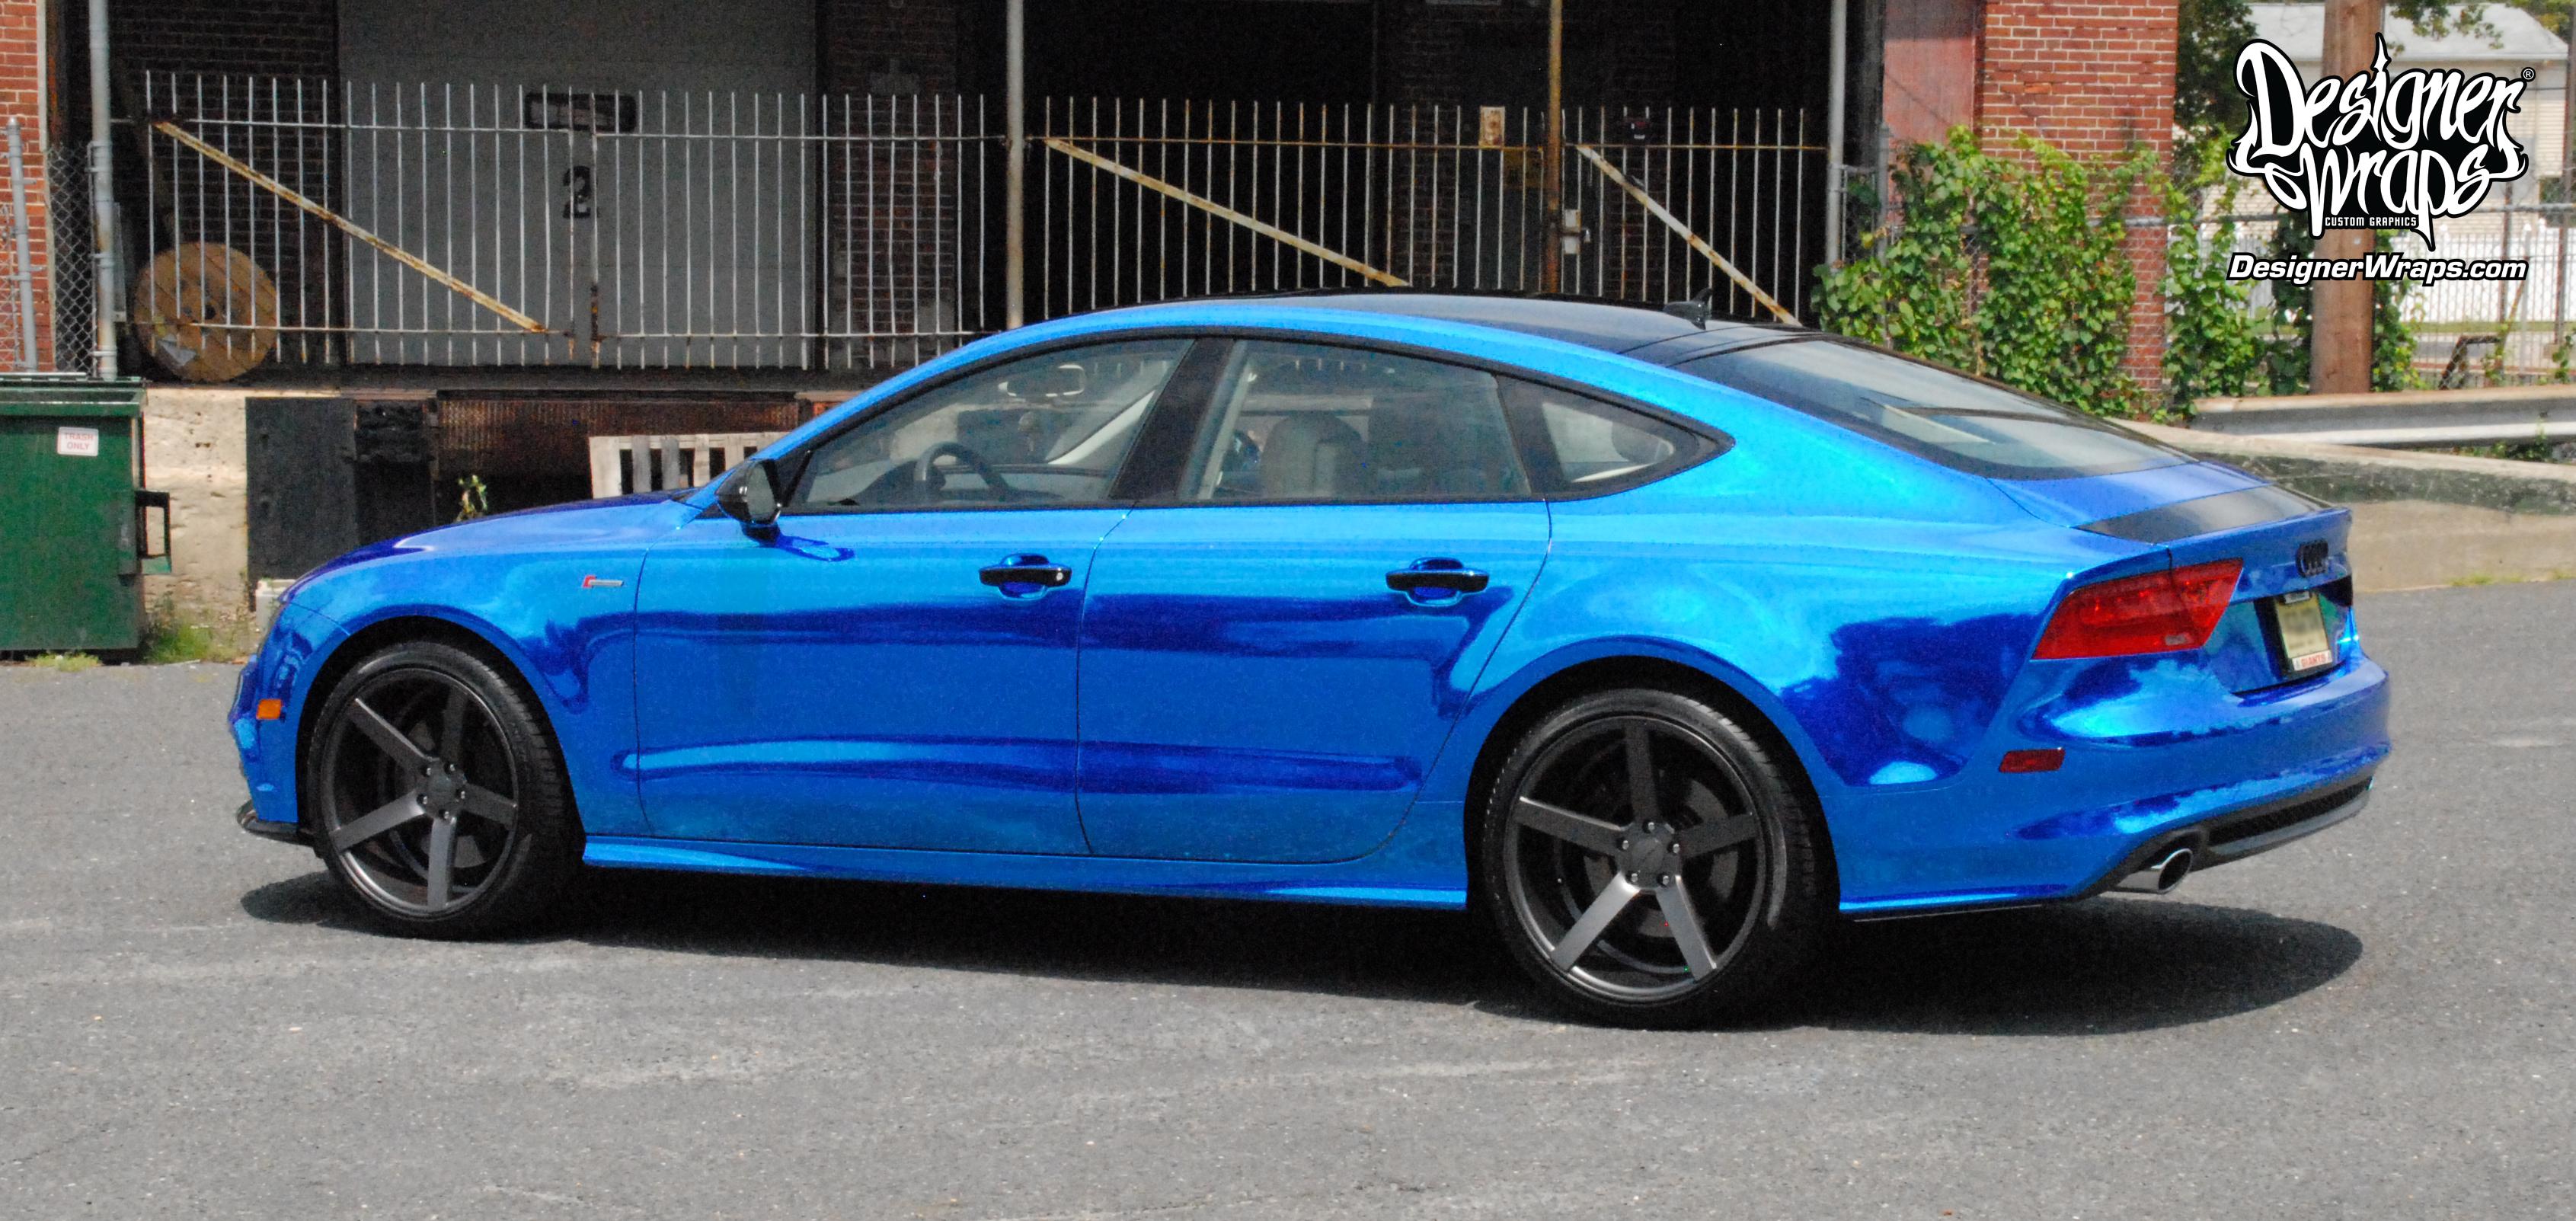 Designer Wraps Custom Vehicle Wraps Fleet Wraps Color Changes Philadelphia Wraps South Jersey Wraps Chrome Blue Audi A7